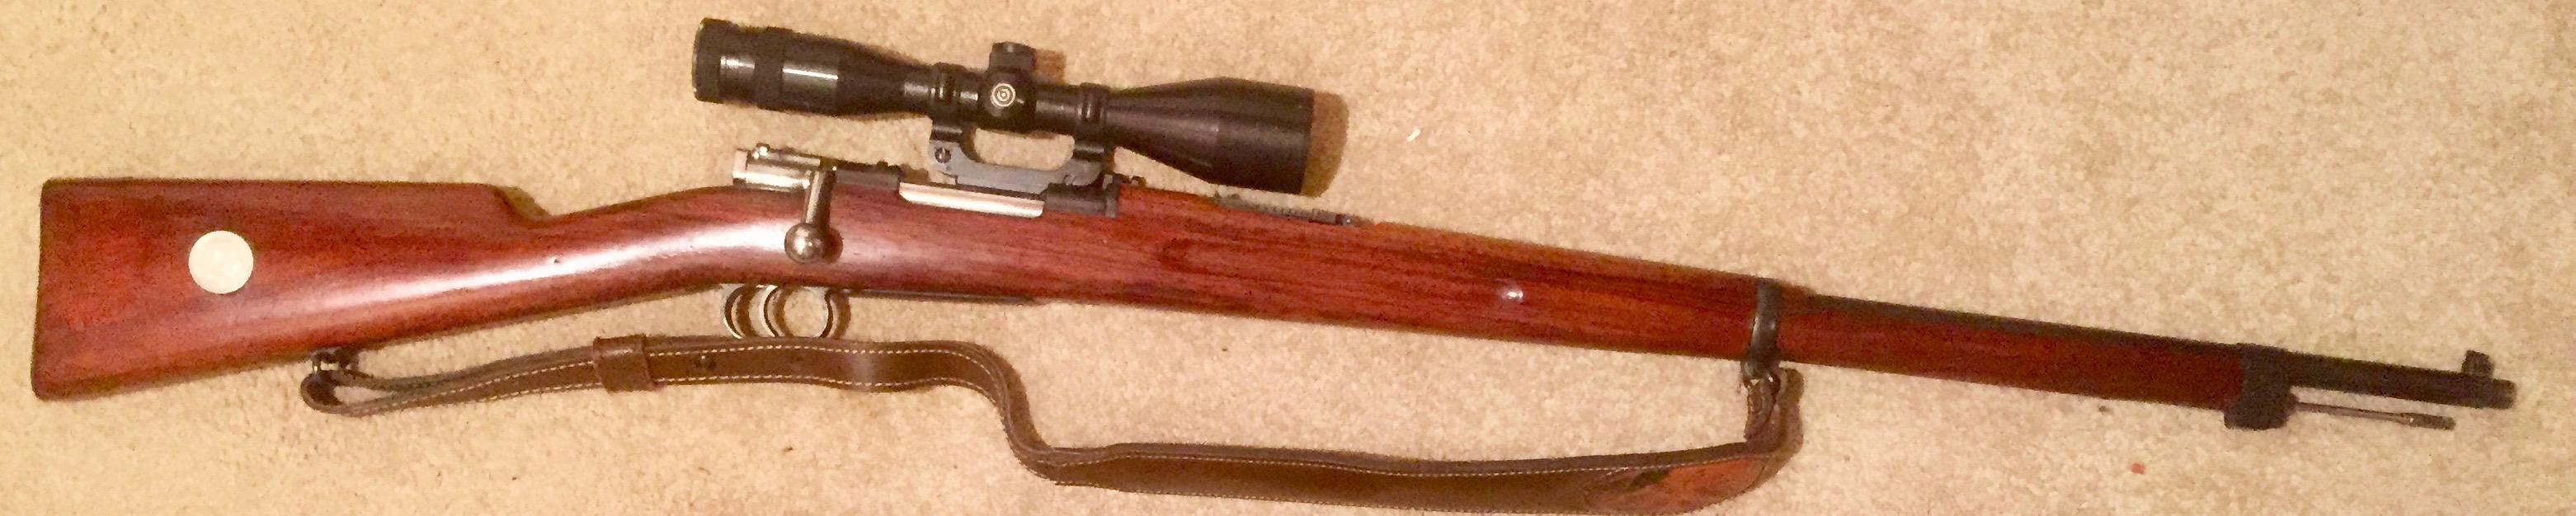 M96 6.5x55.jpg